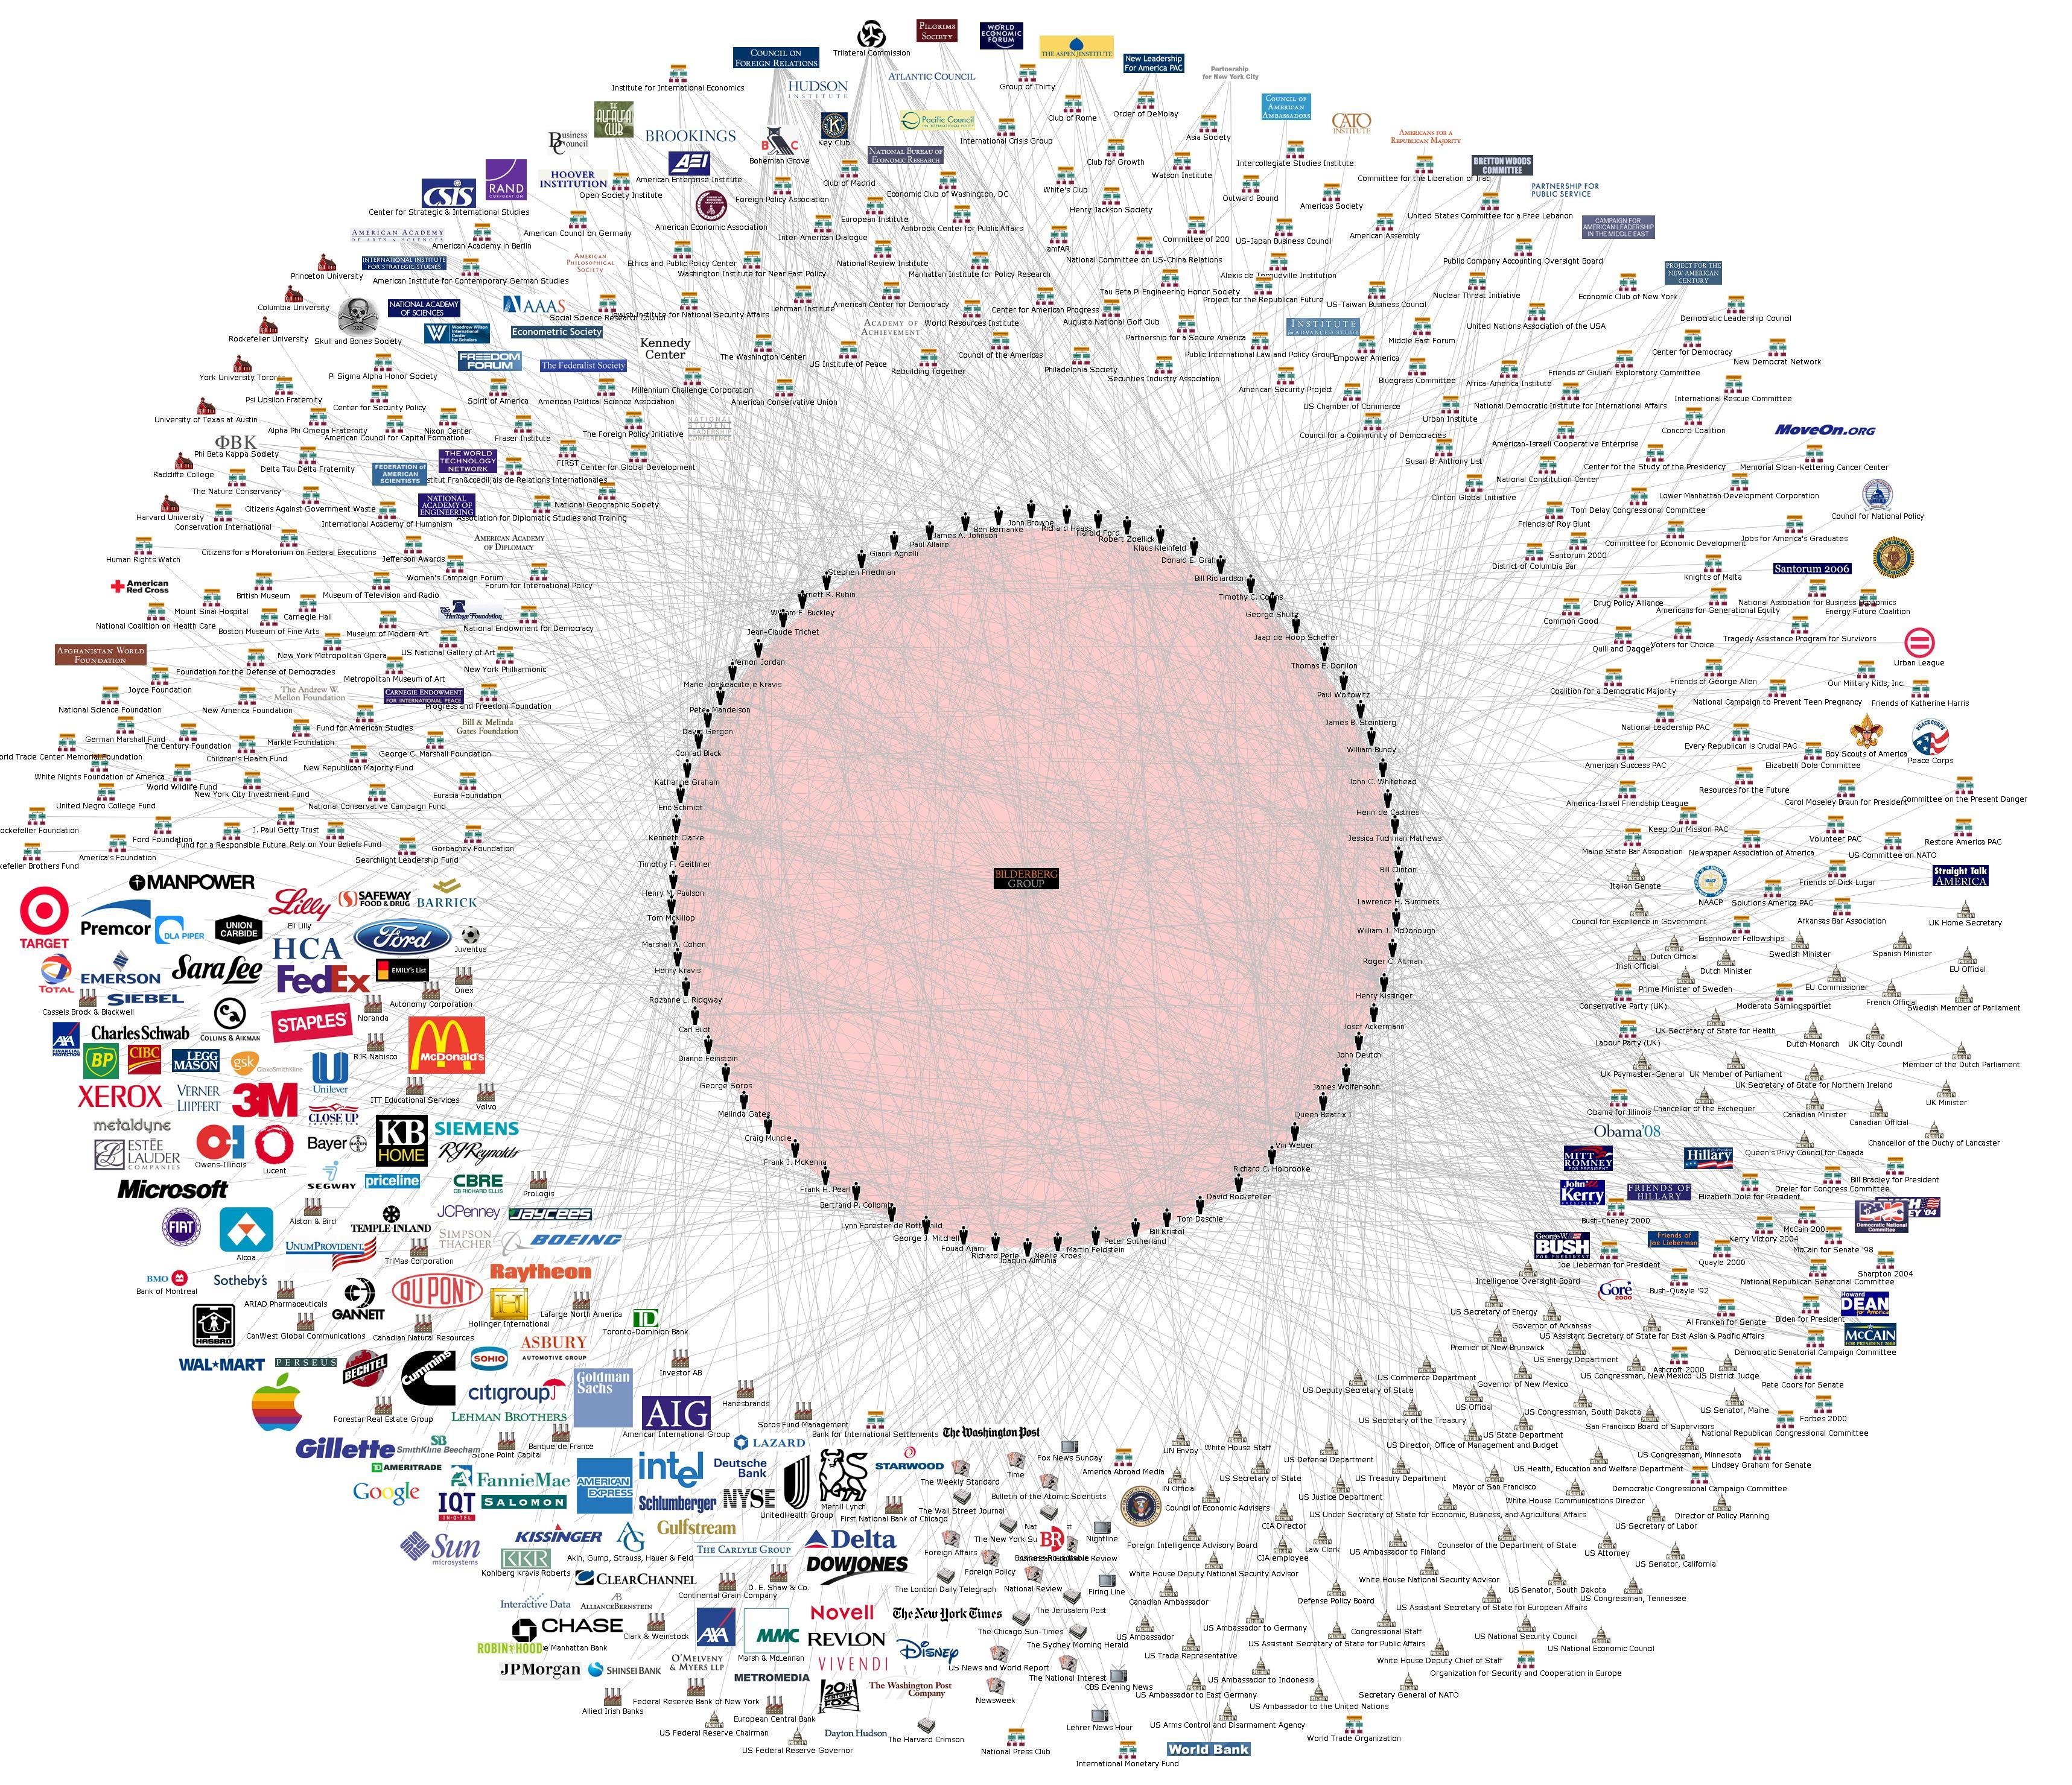 bilderberg connections core group